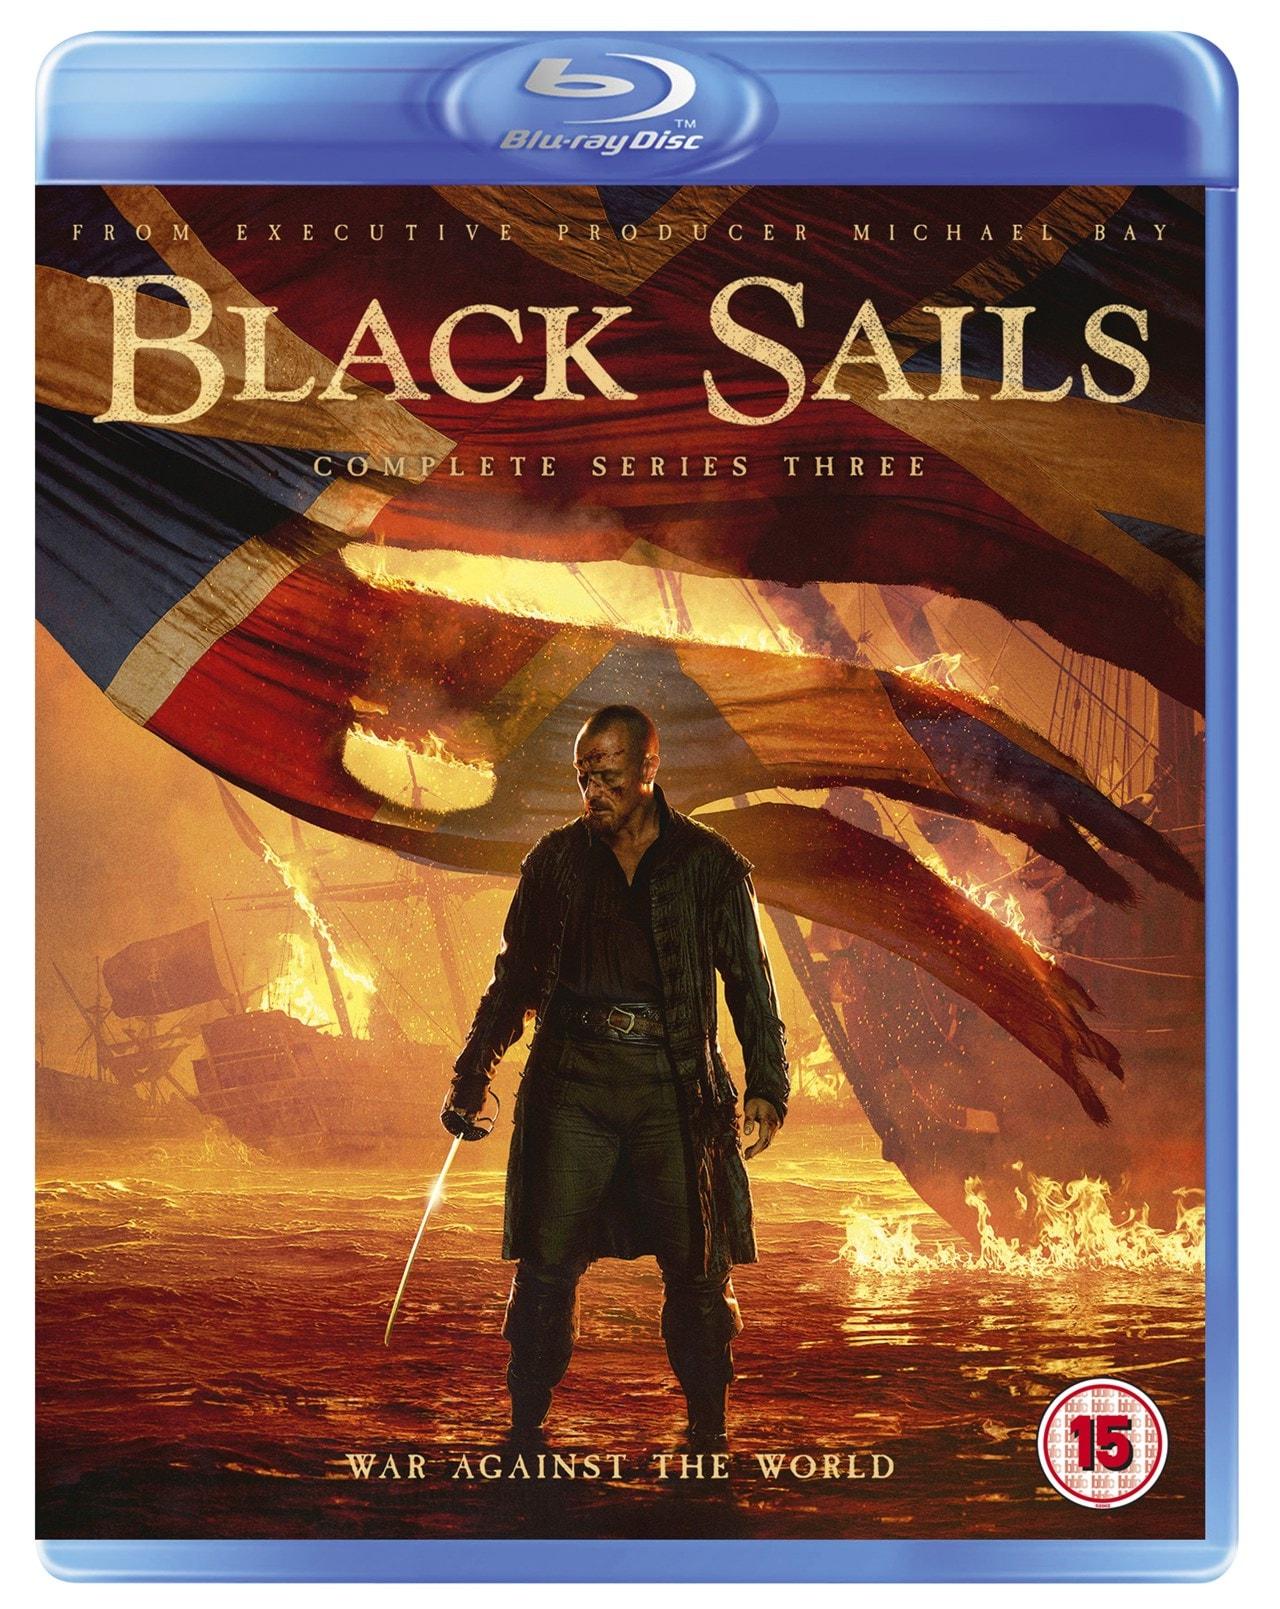 Black Sails: Complete Series Three - 1